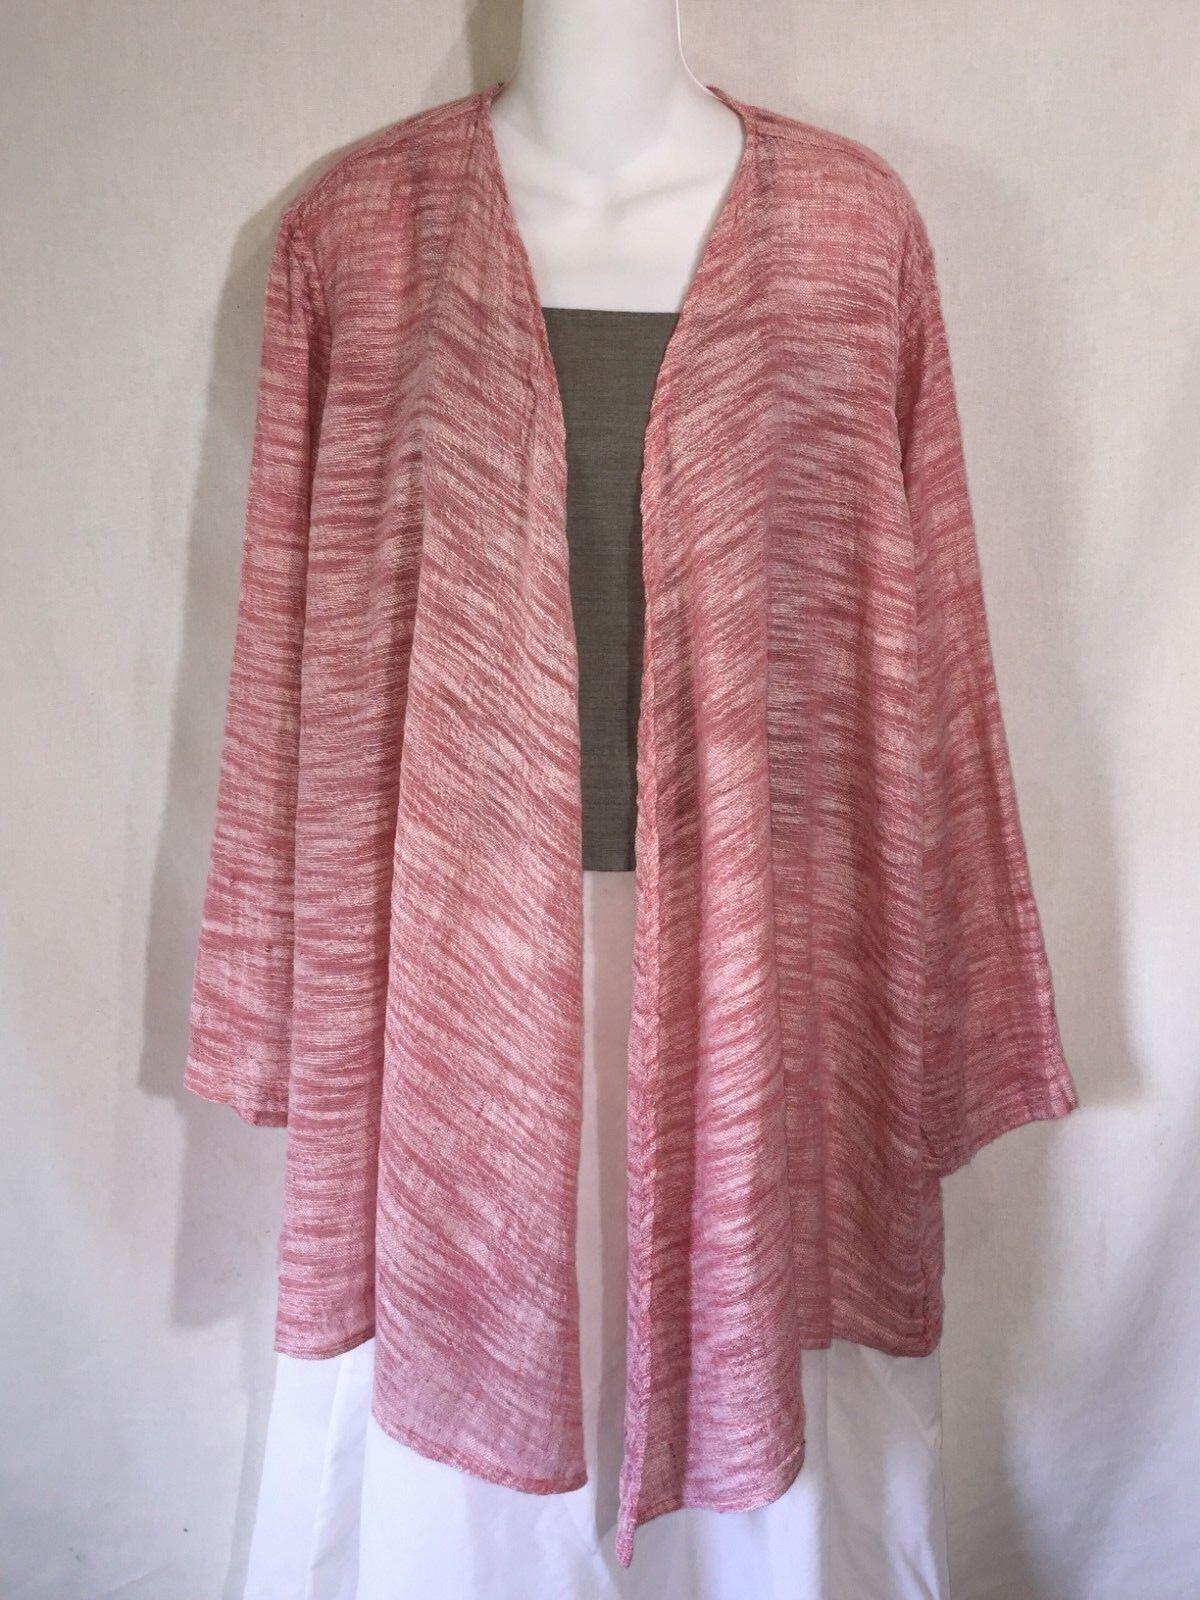 FLAX Engelhart Long Loose Rosa Gauze Linen Lagenlook Open Cardigan Jacket Top M